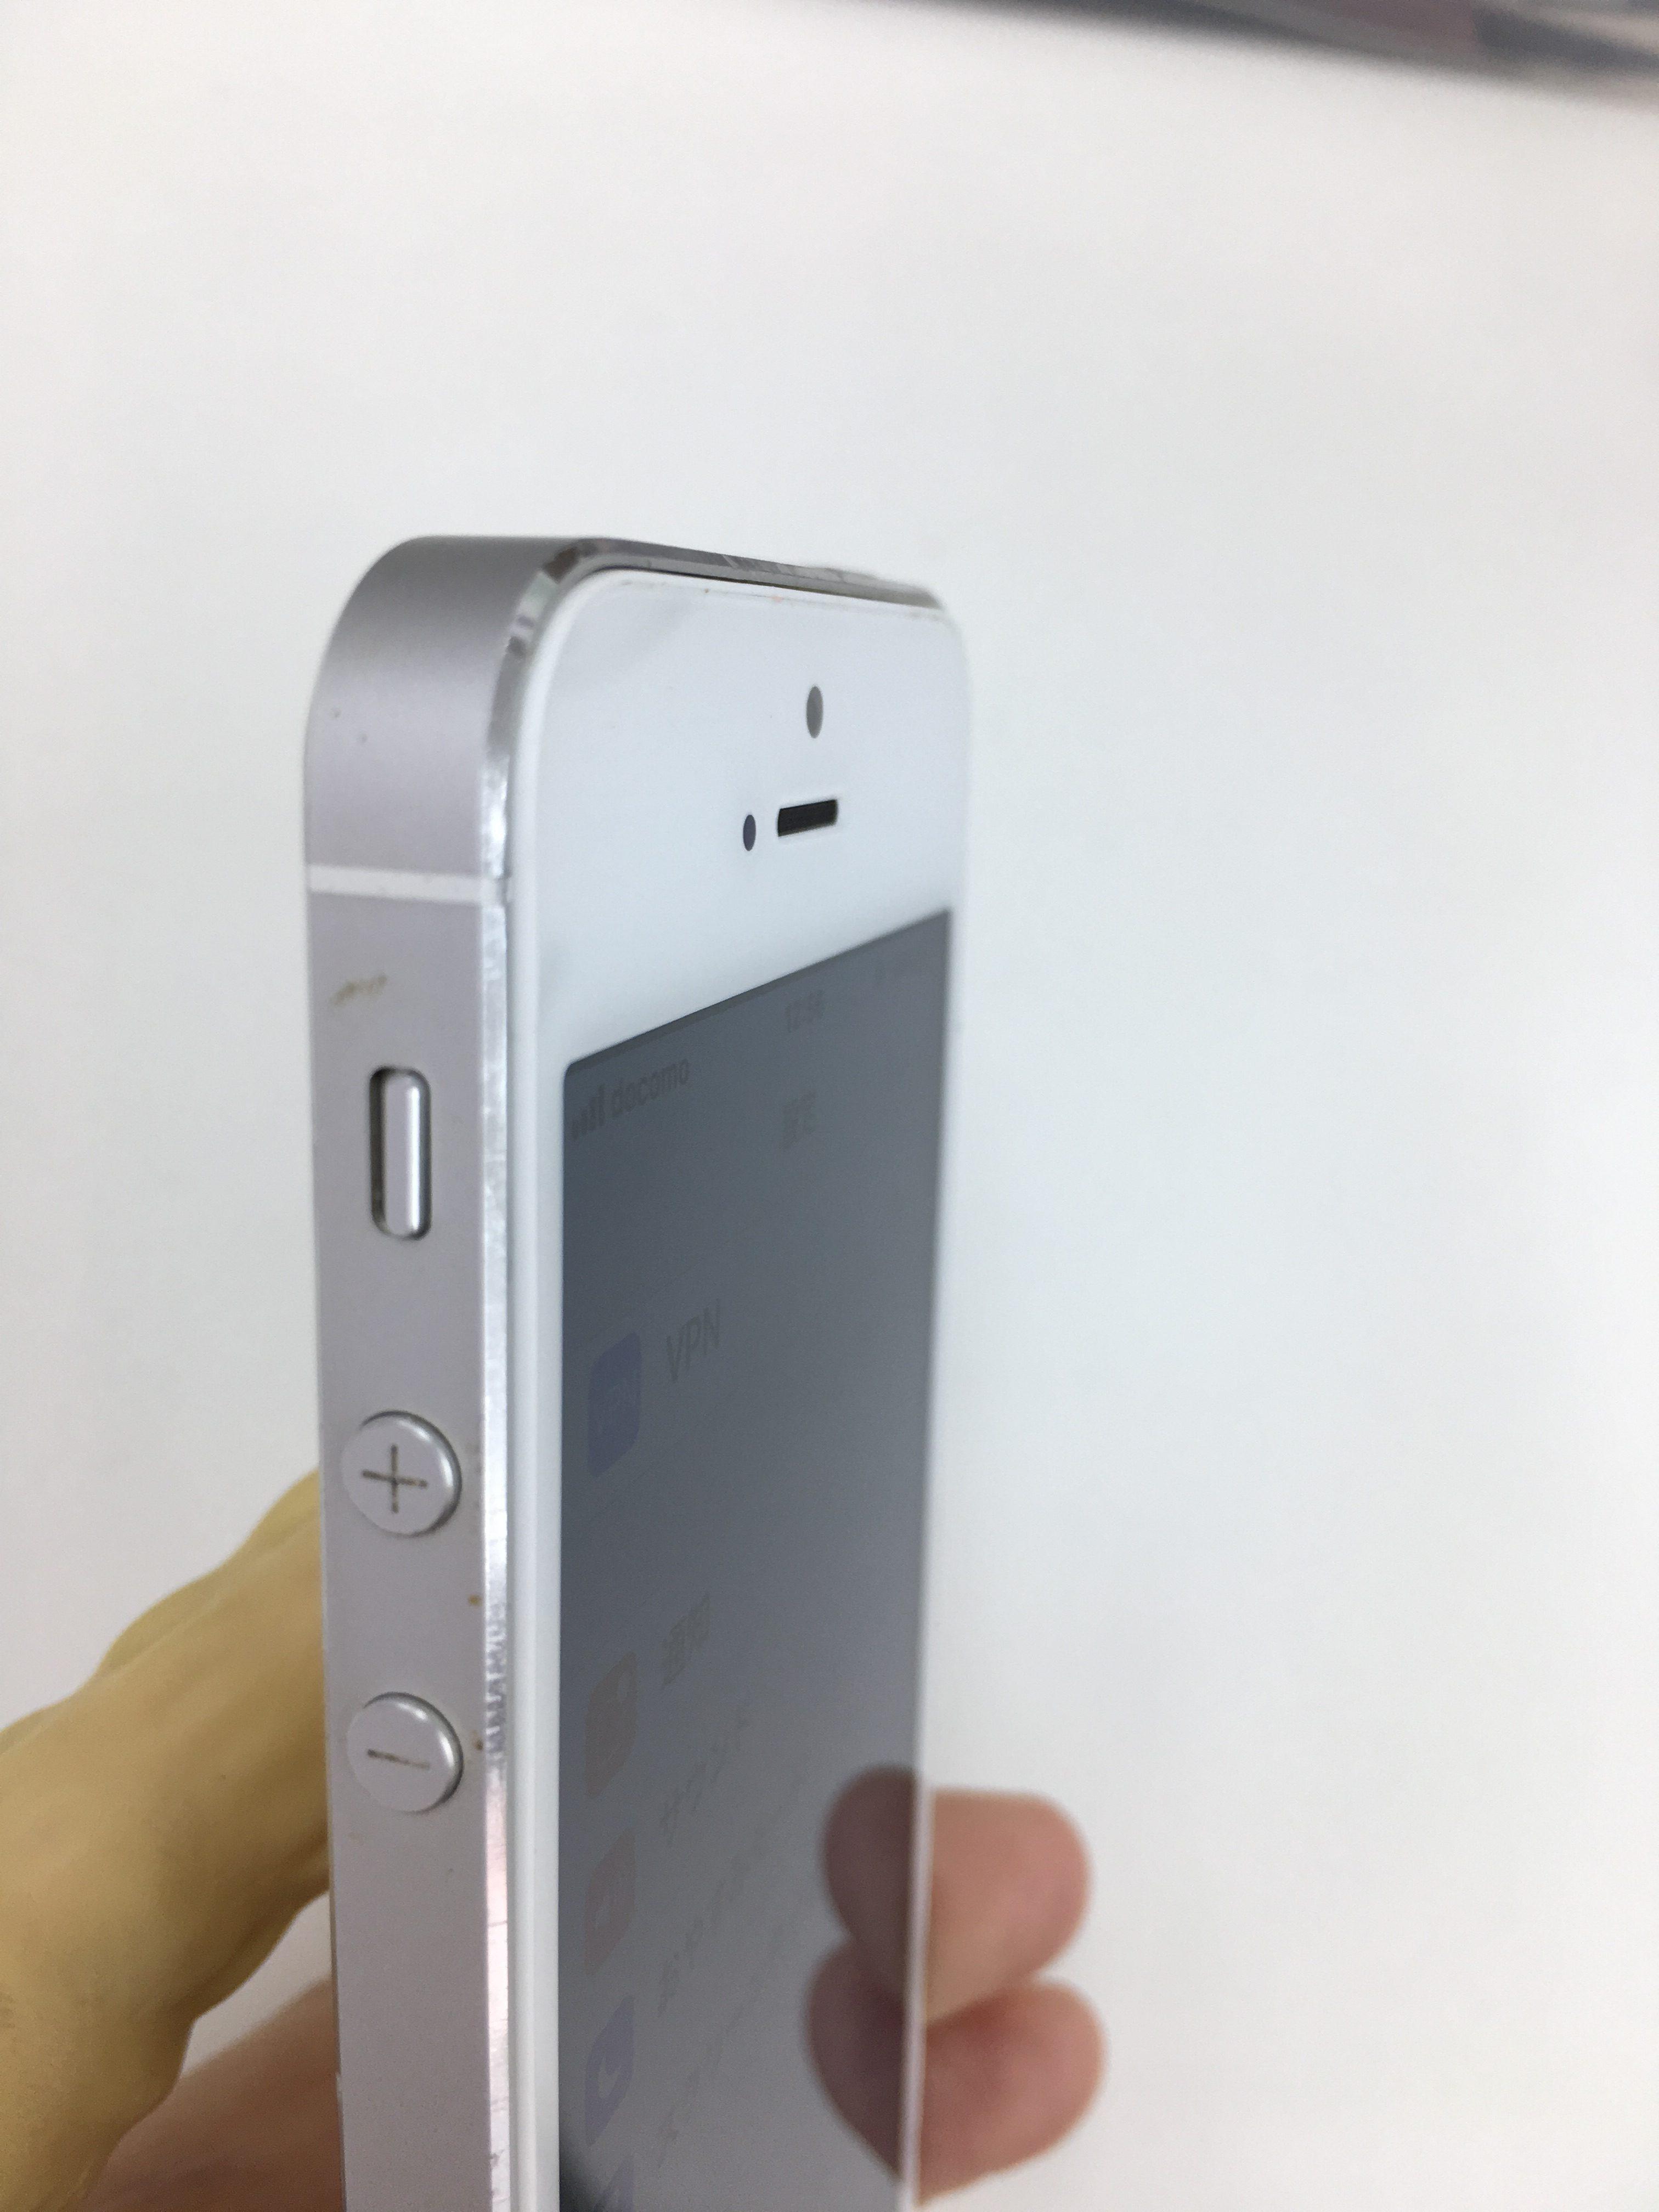 iPhone5s バッテリー交換後